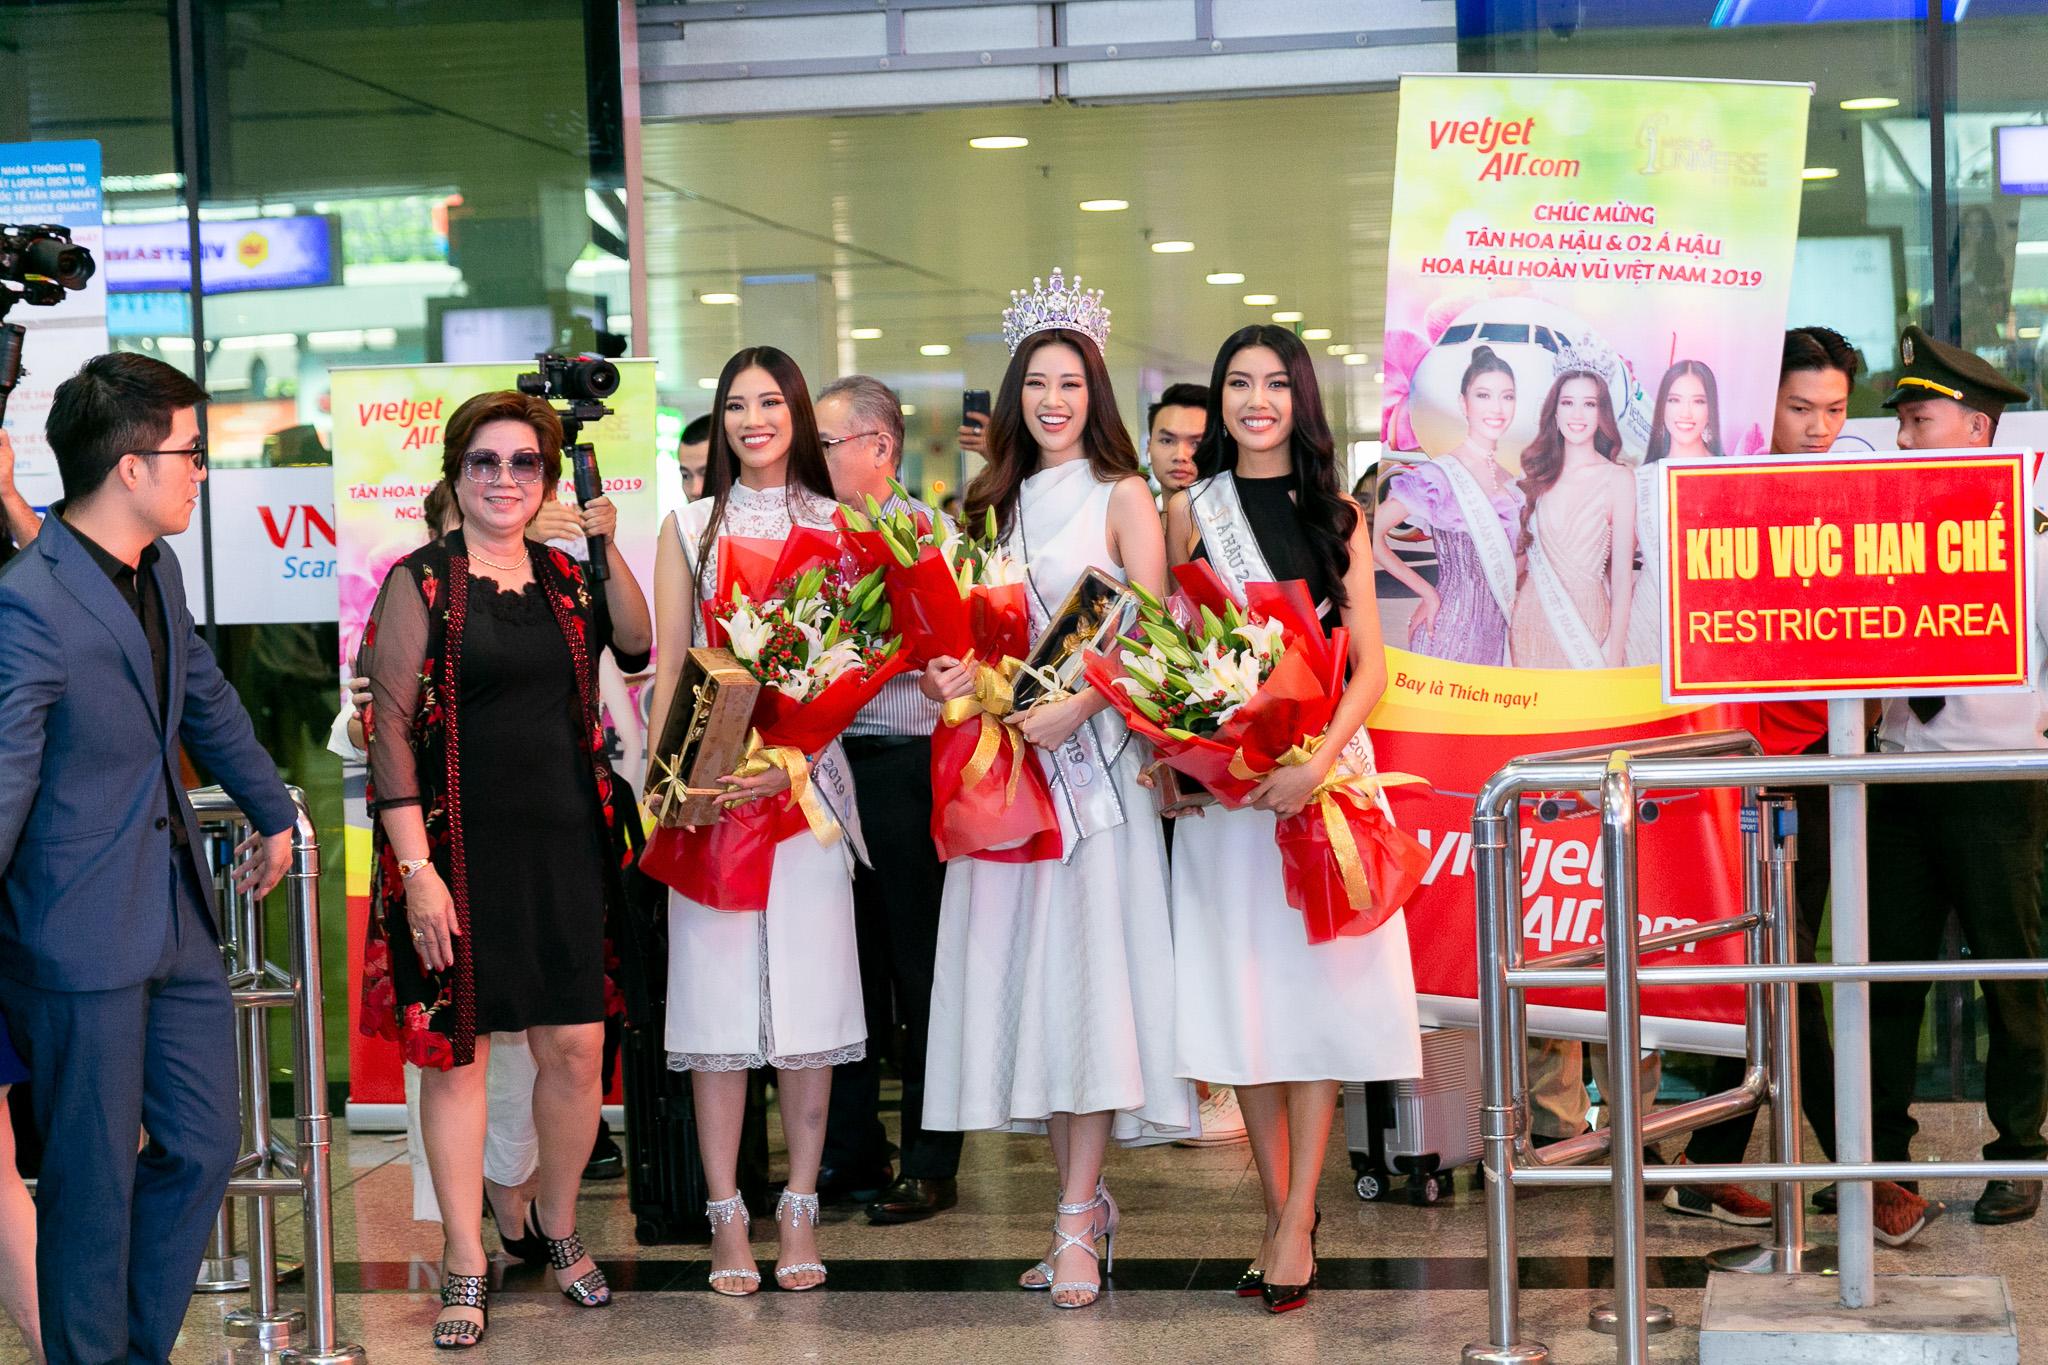 Top 3 Hoa hau Hoan vu Viet Nam 2019 tro ve TPHCM (50)